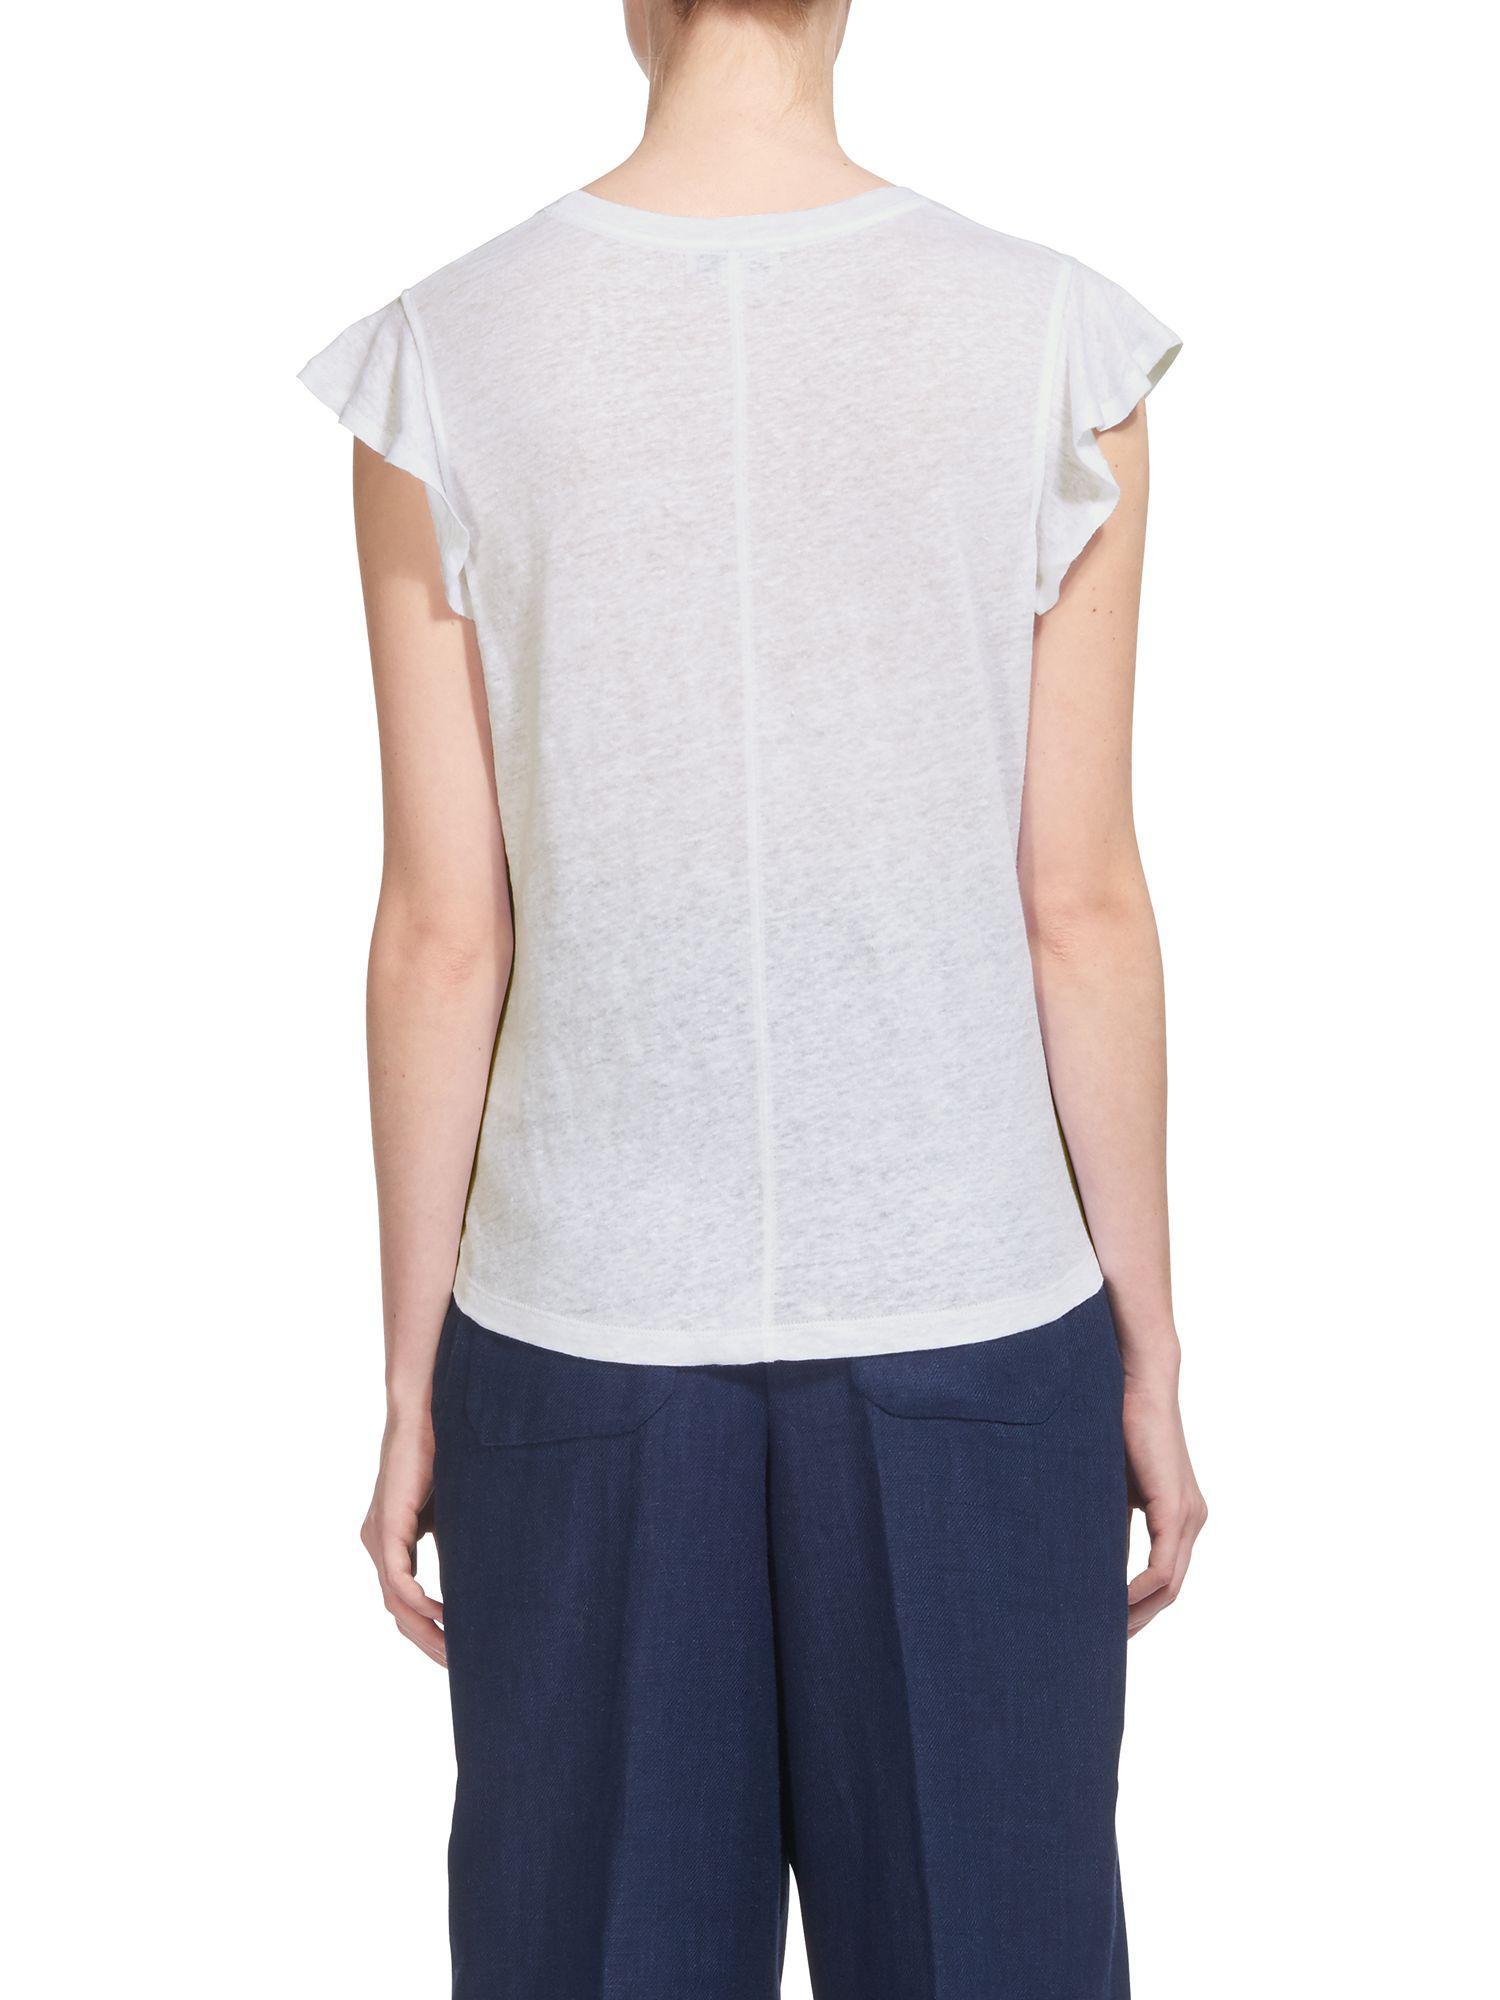 980ec822723e7 Whistles. Women s White Frill Sleeveless Linen Top. £55 £15 From John Lewis  and Partners